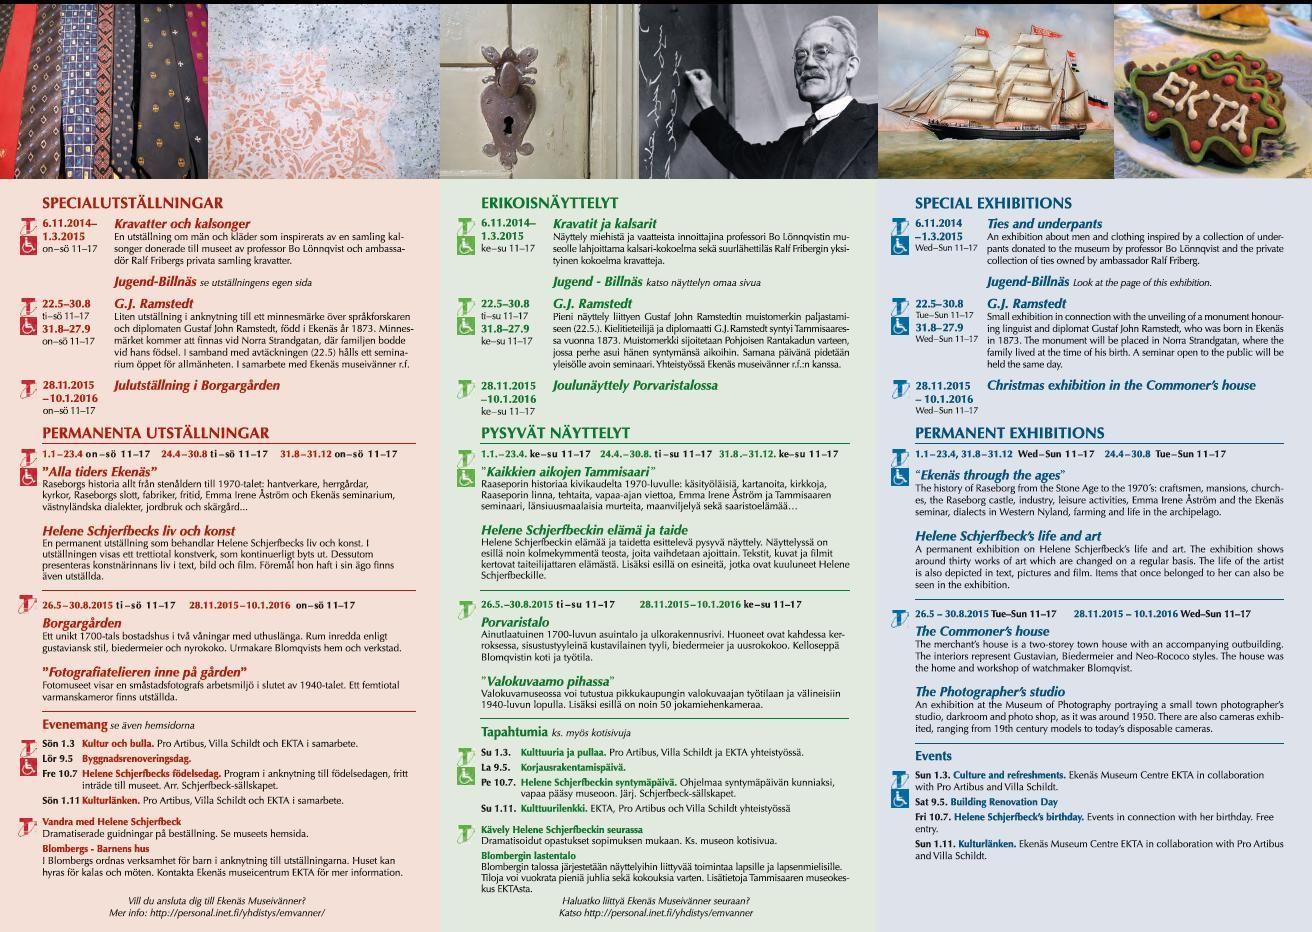 Utställningar och evenemang i EKTA 2015 / Näyttelyt  ja tapahtumat EKTAssa 2015 / Exhibitions  and Events in EKTA 2015  #EKTAMuseumcenter #Schjerfbeck #Jugend #VisitRaseborg #Museum #Raseborg #Ekenäs